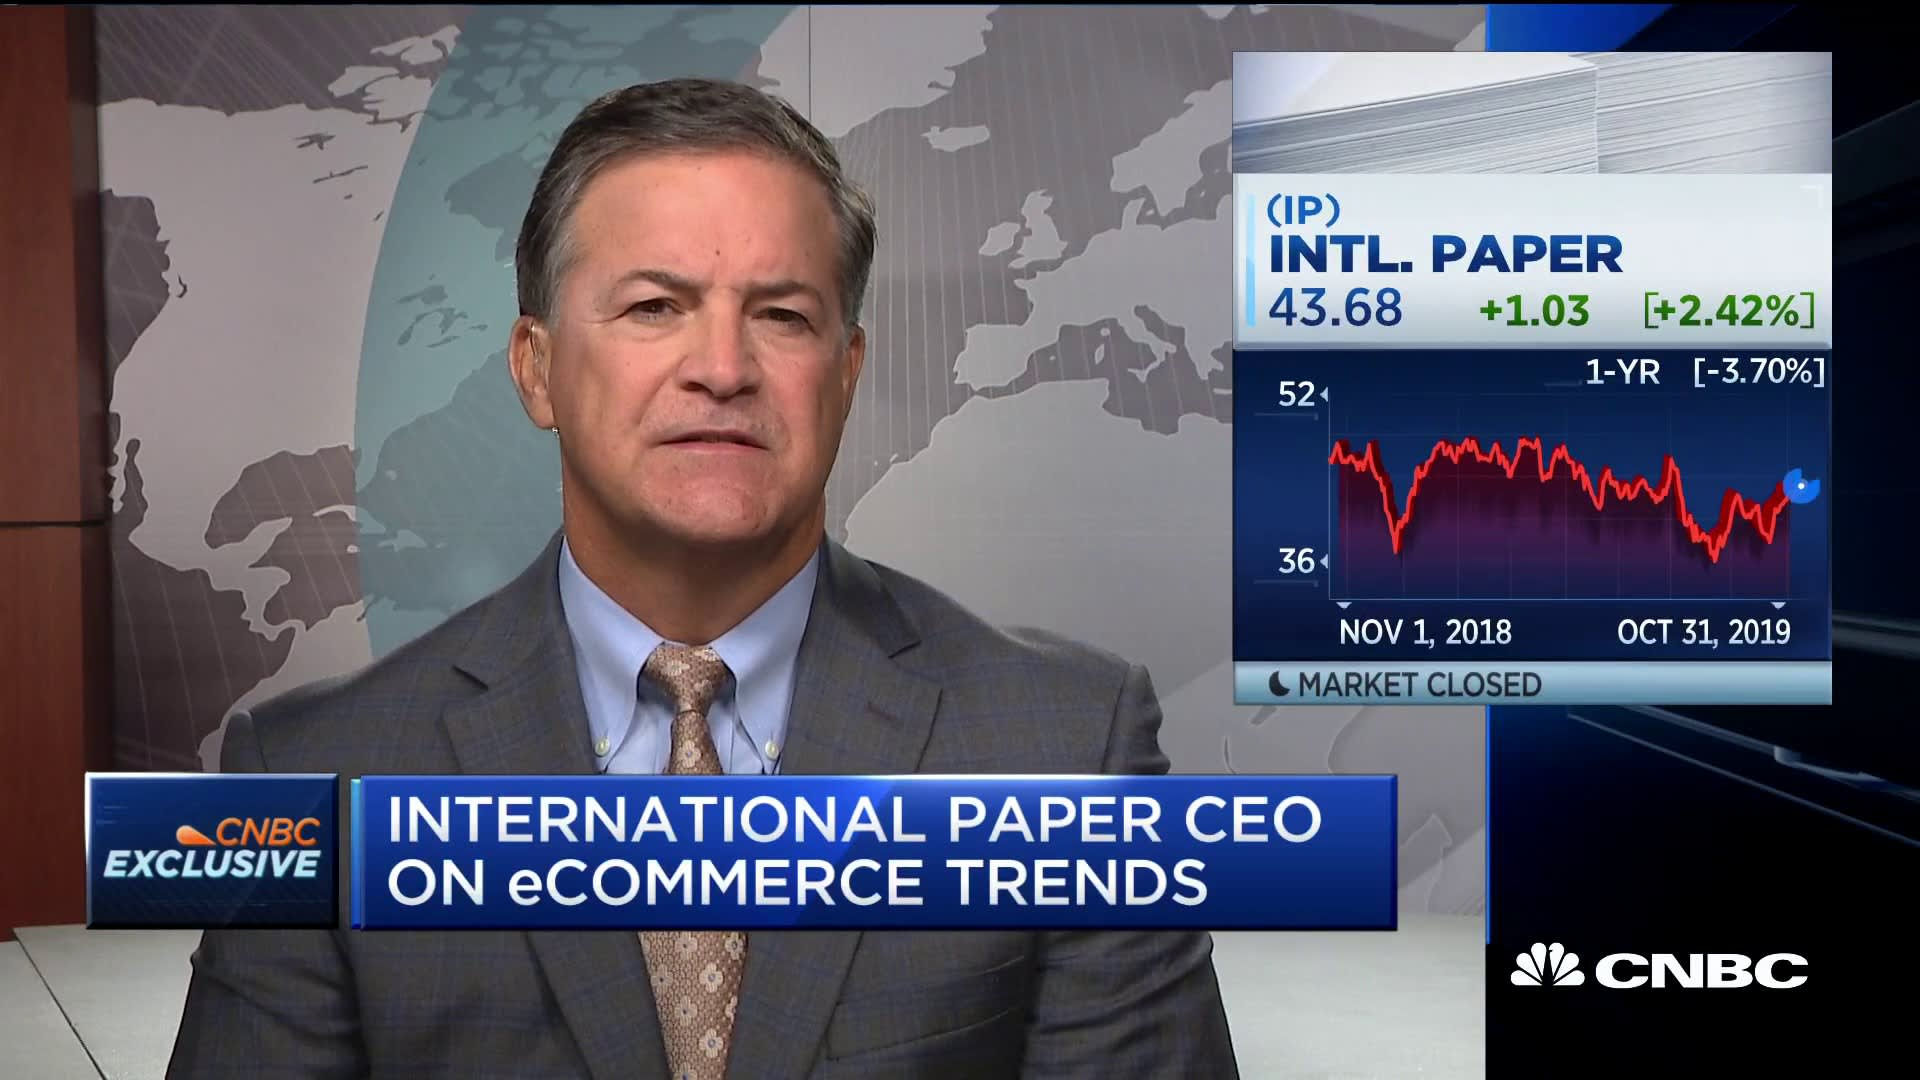 Sutton: US demand strong but global demand in decline